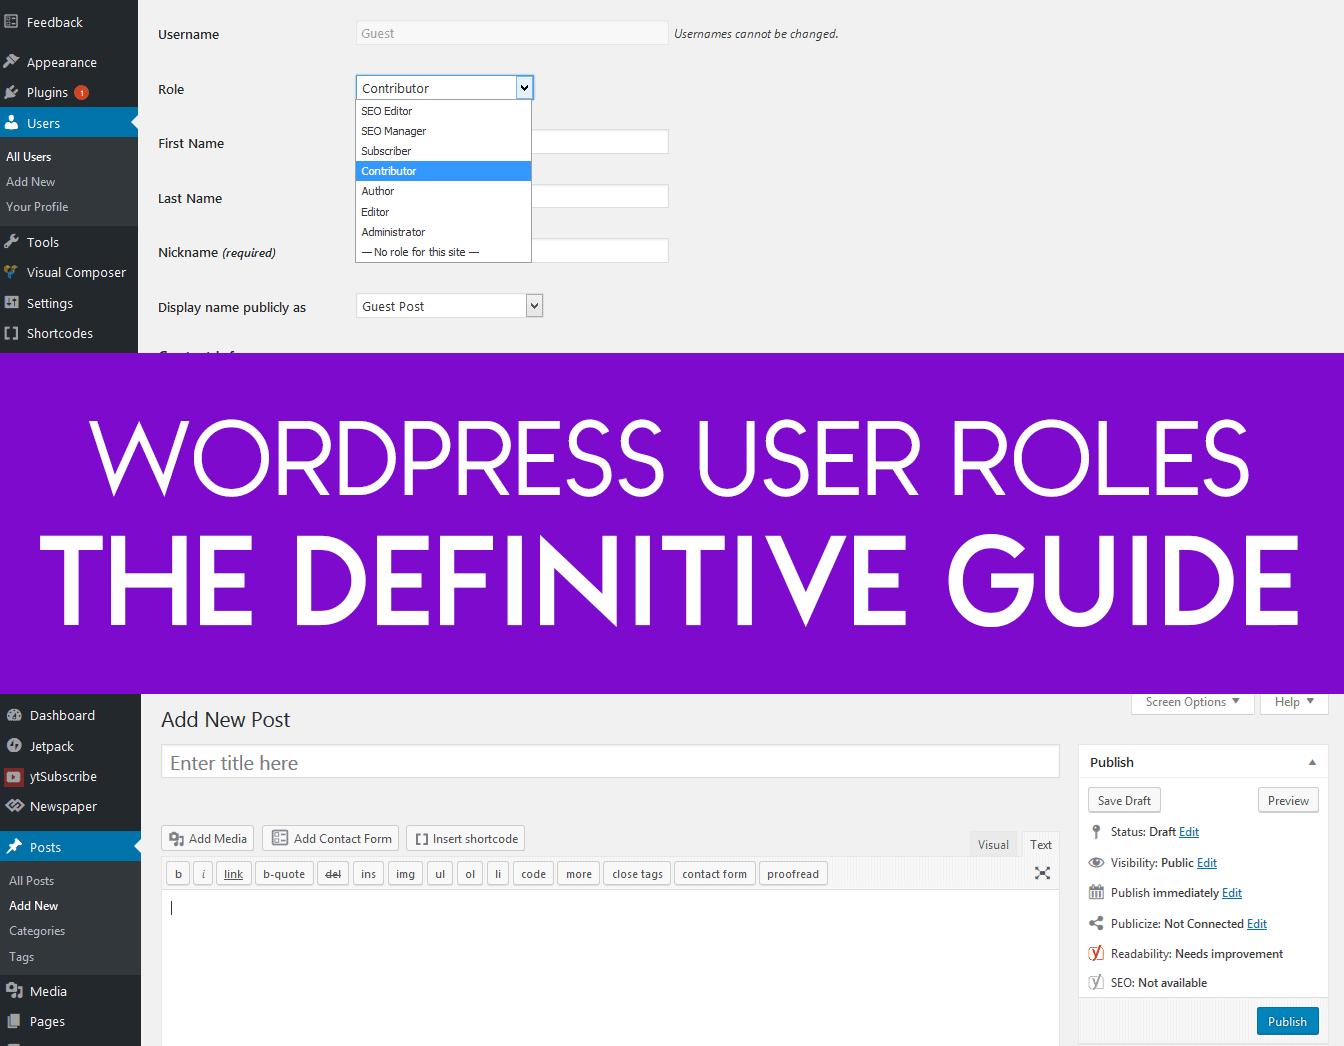 WordPress_User_Roles.png